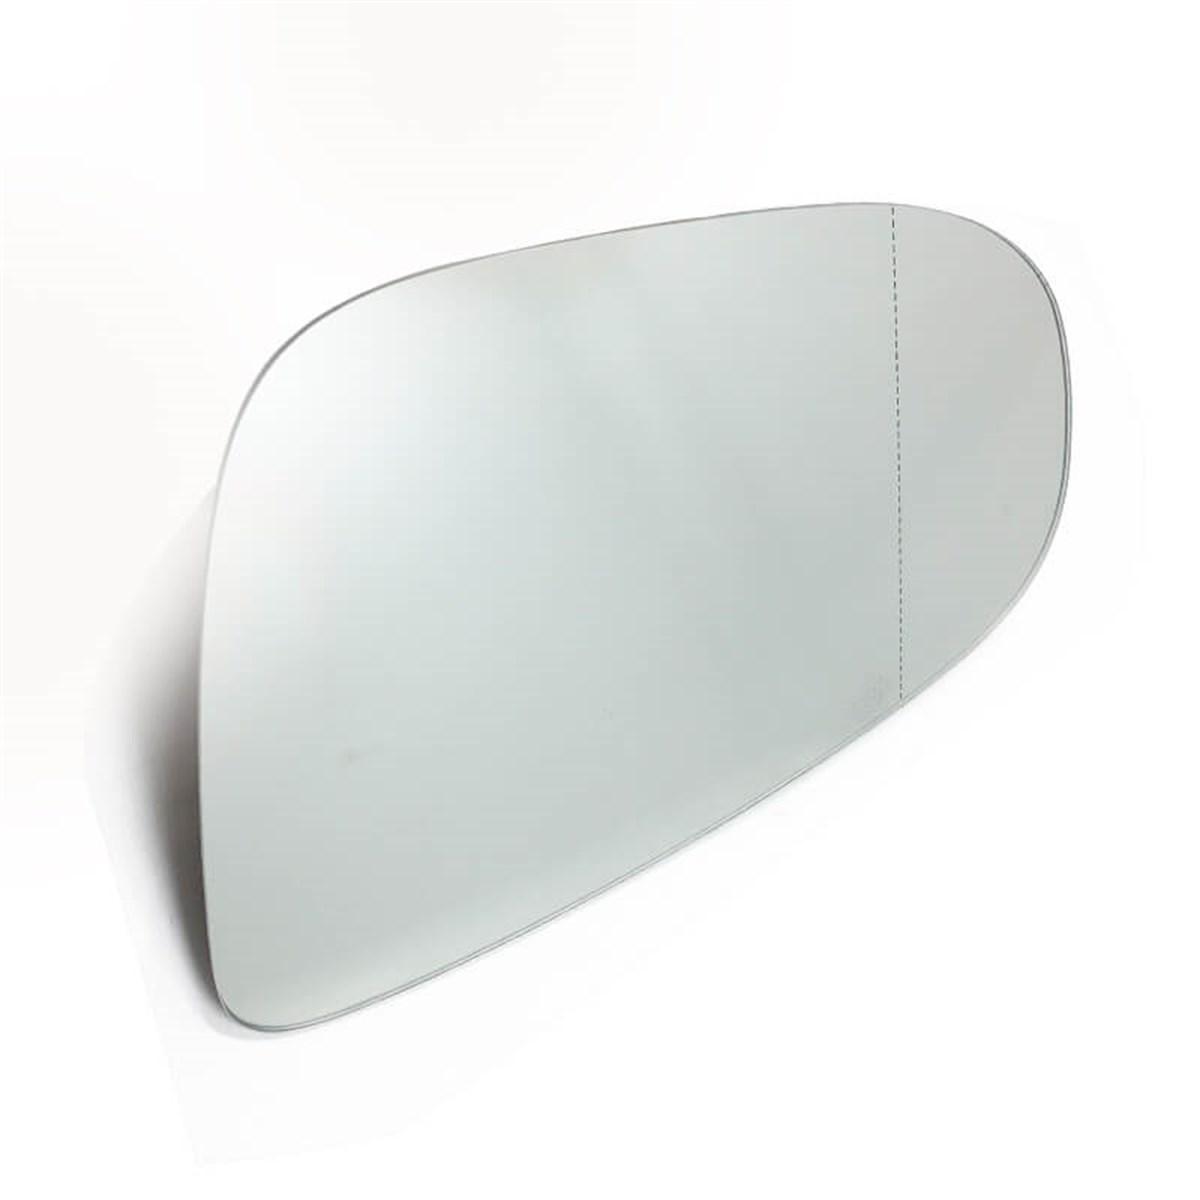 Ayna Camı Sol  - Volkswagen - Golf 6